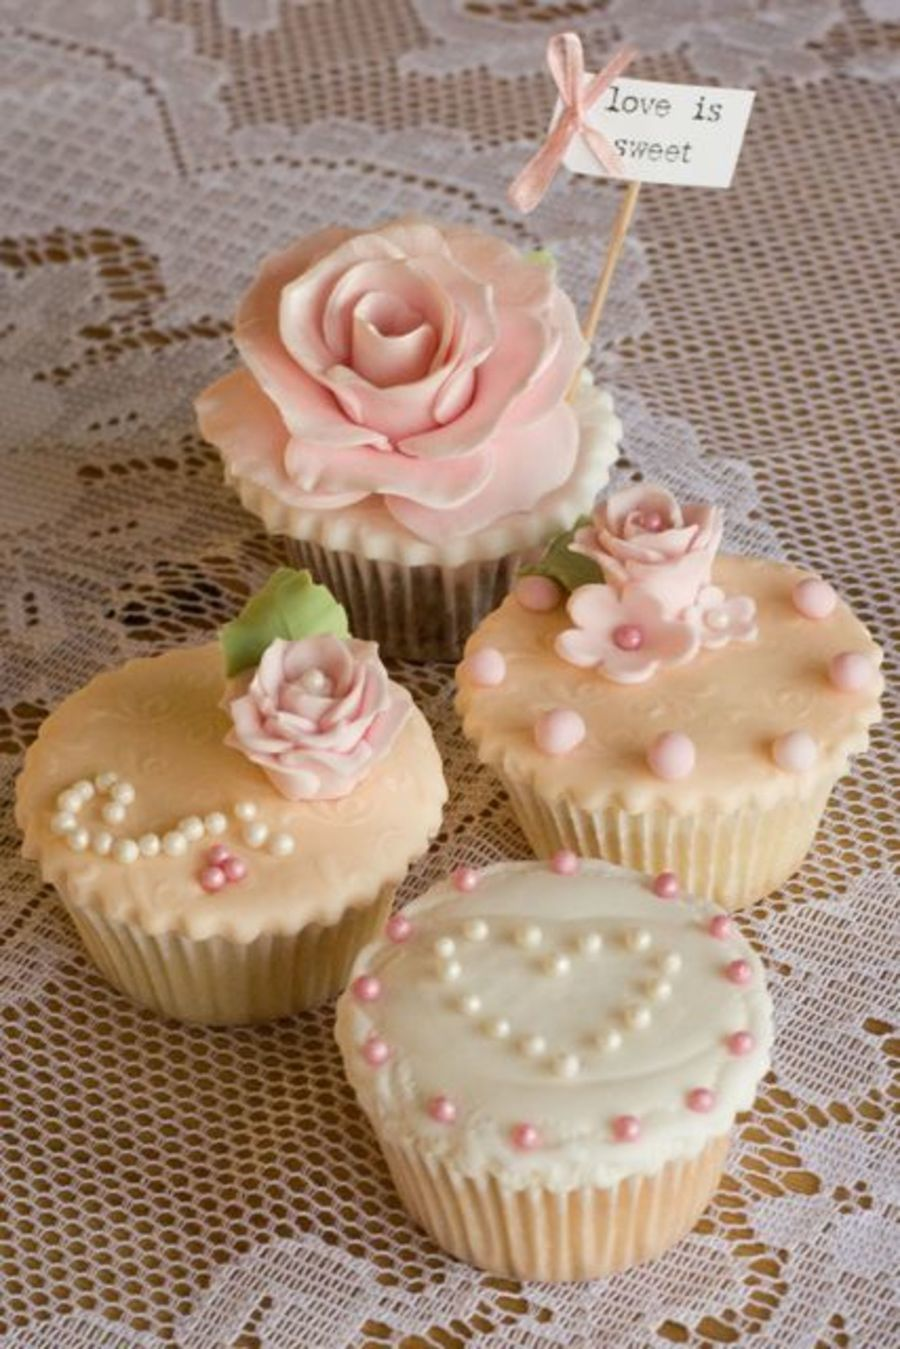 vintage wedding cupcakes wedding cupcake ideas Vintage Wedding Cupcakes on Cake Central